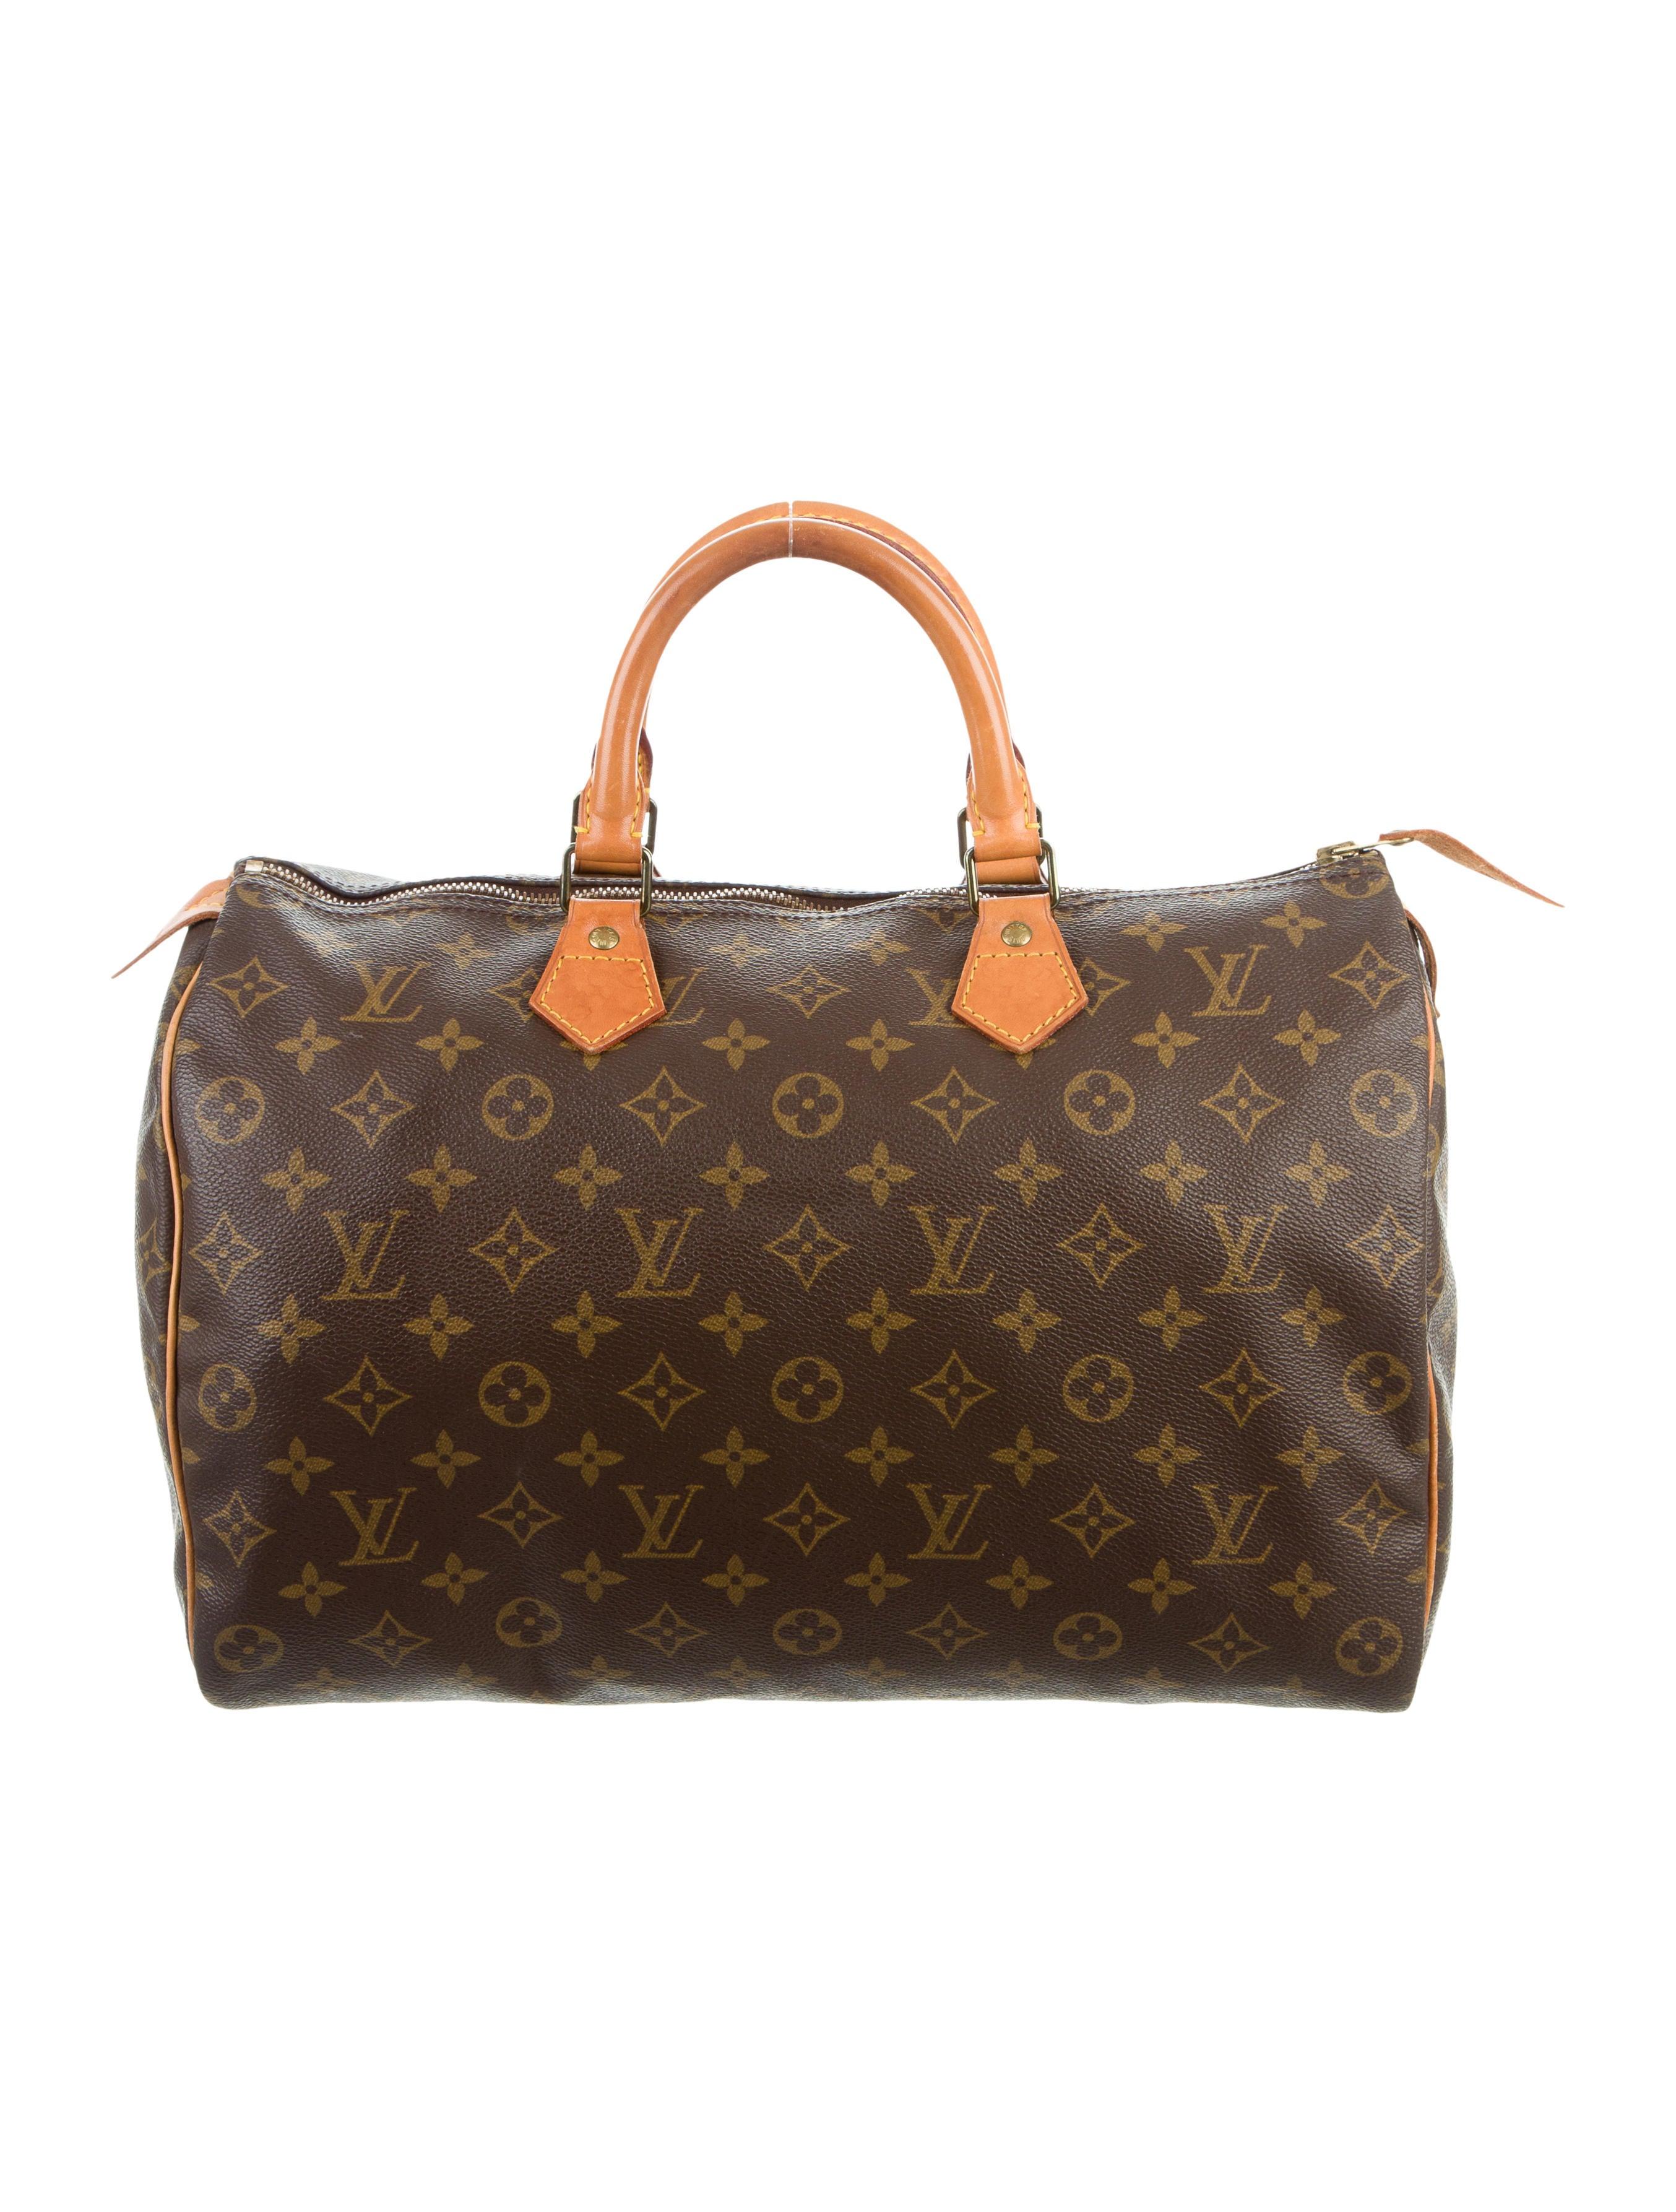 louis vuitton monogram speedy 35 handbags lou120910. Black Bedroom Furniture Sets. Home Design Ideas